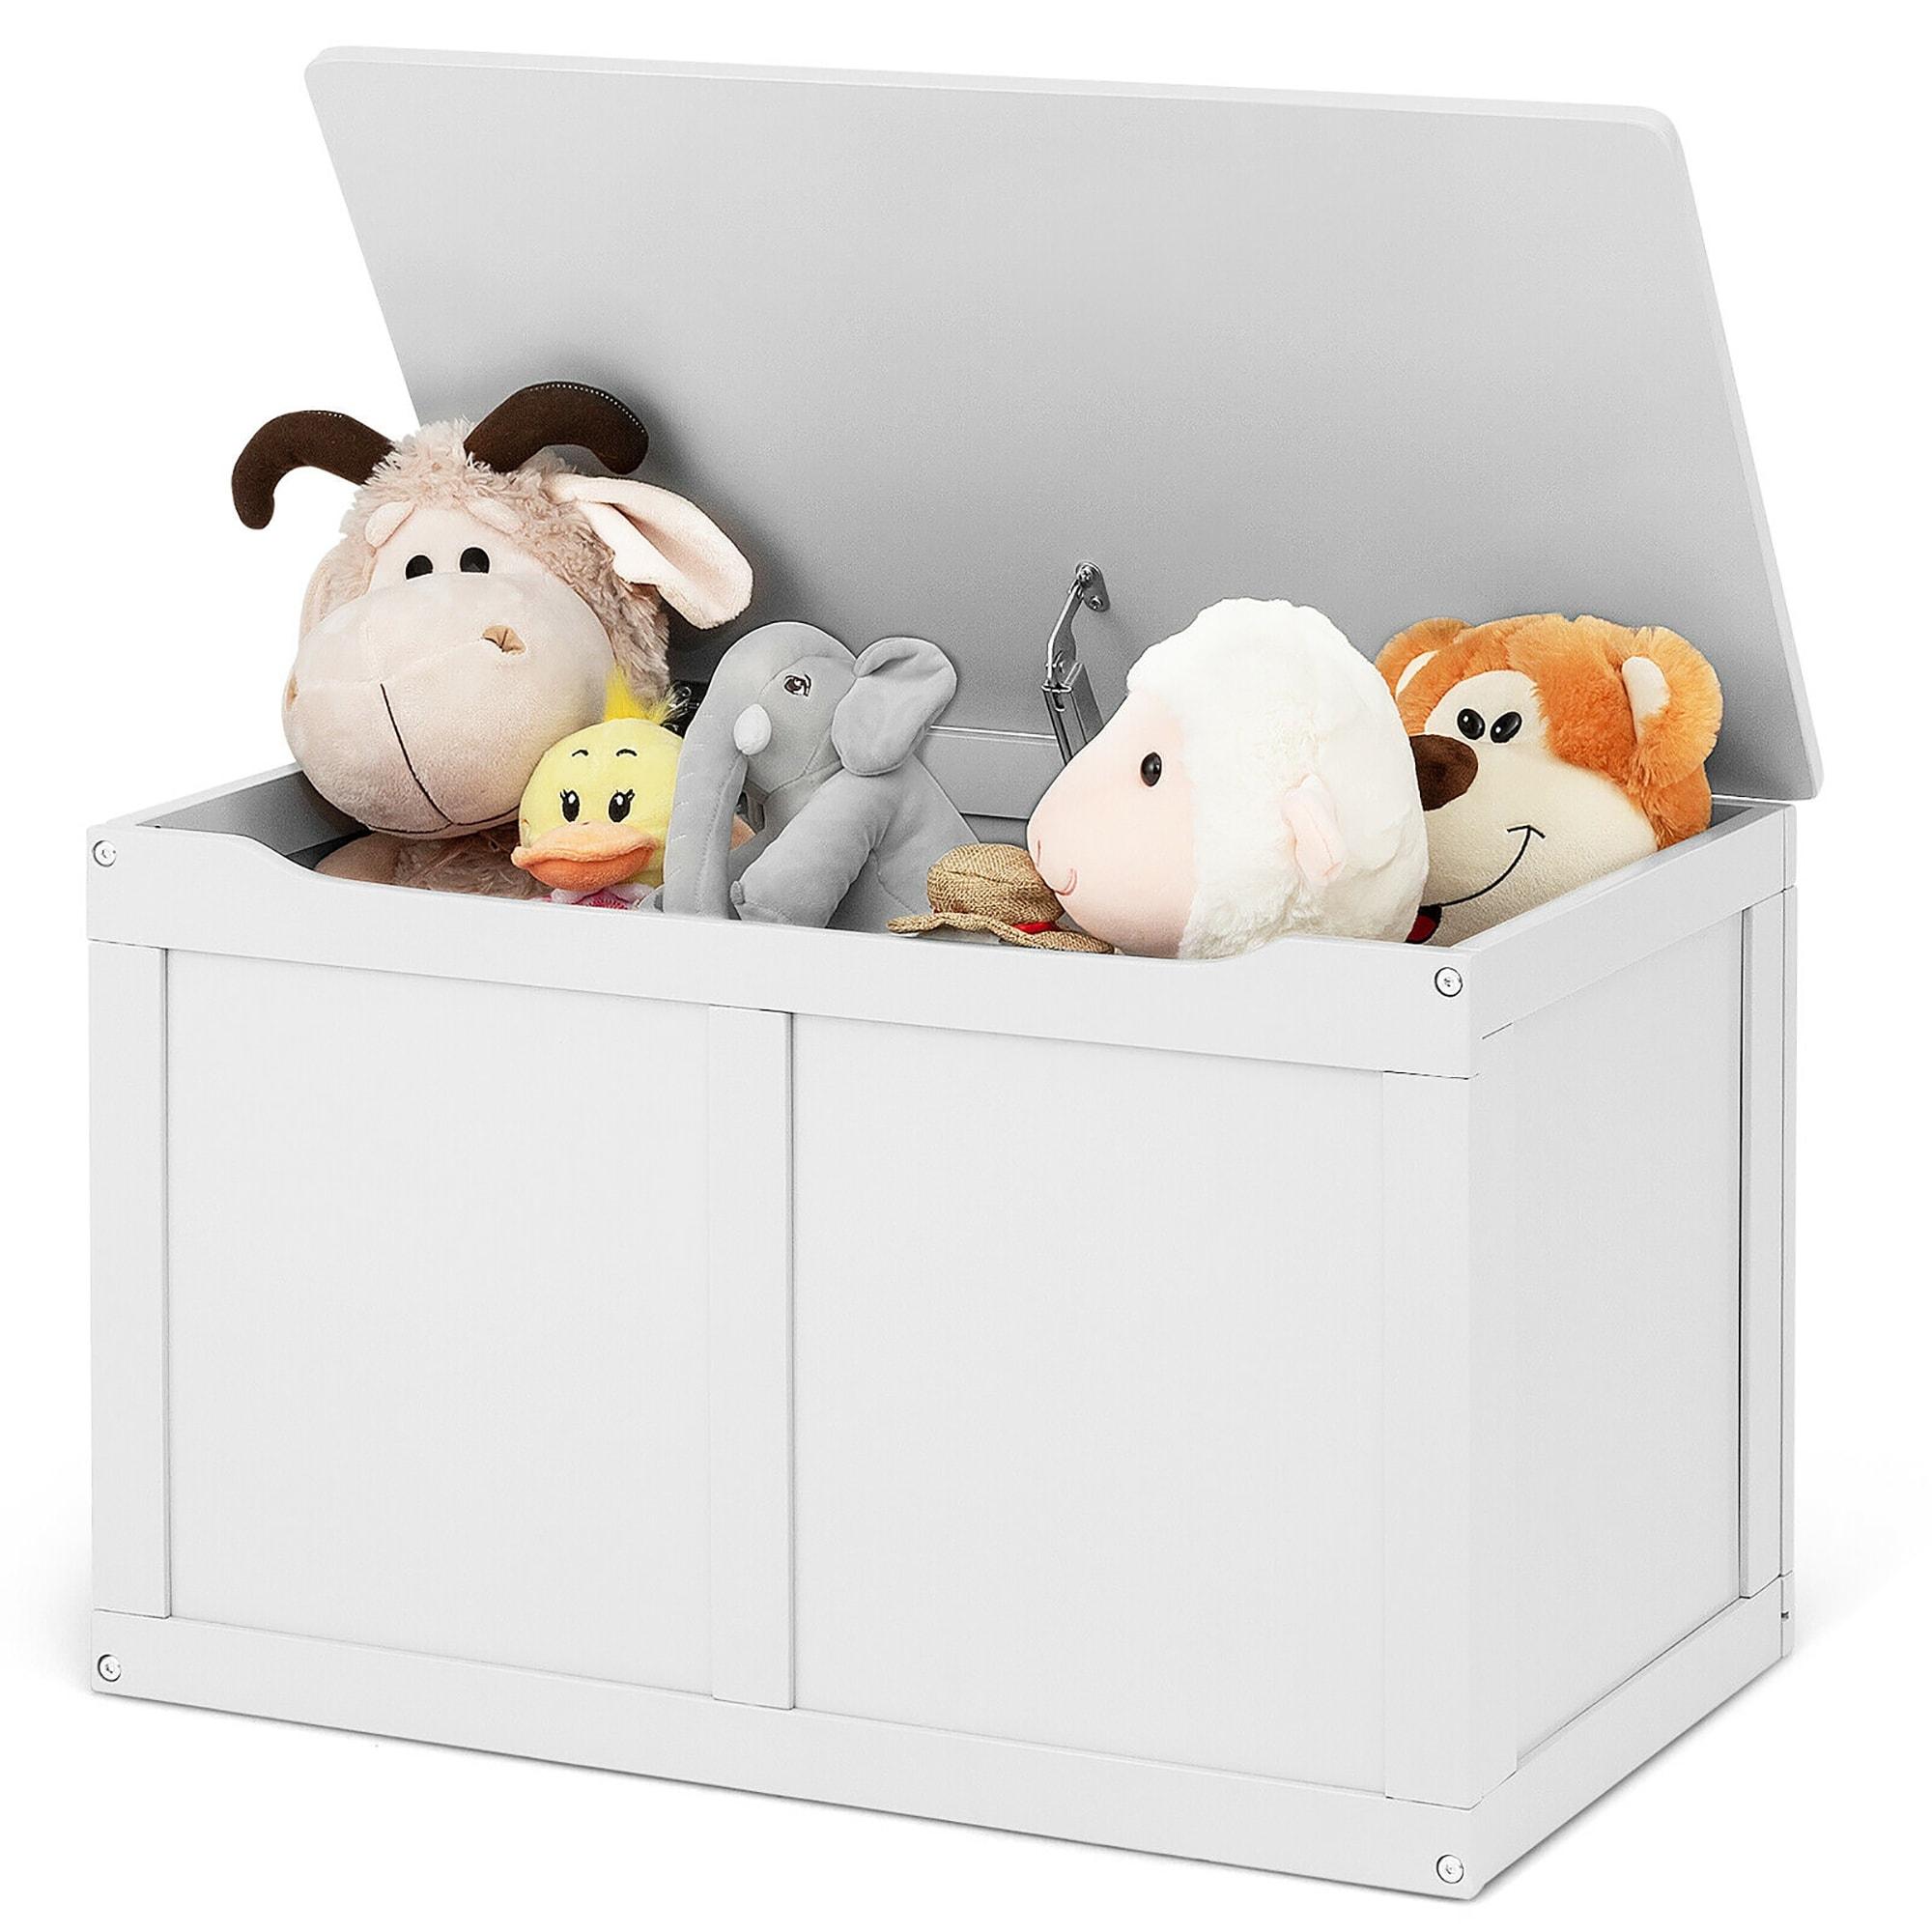 Costway Wooden Kids Toy Storage Box Sitting Top Chest Organizer Large On Sale Overstock 18225435